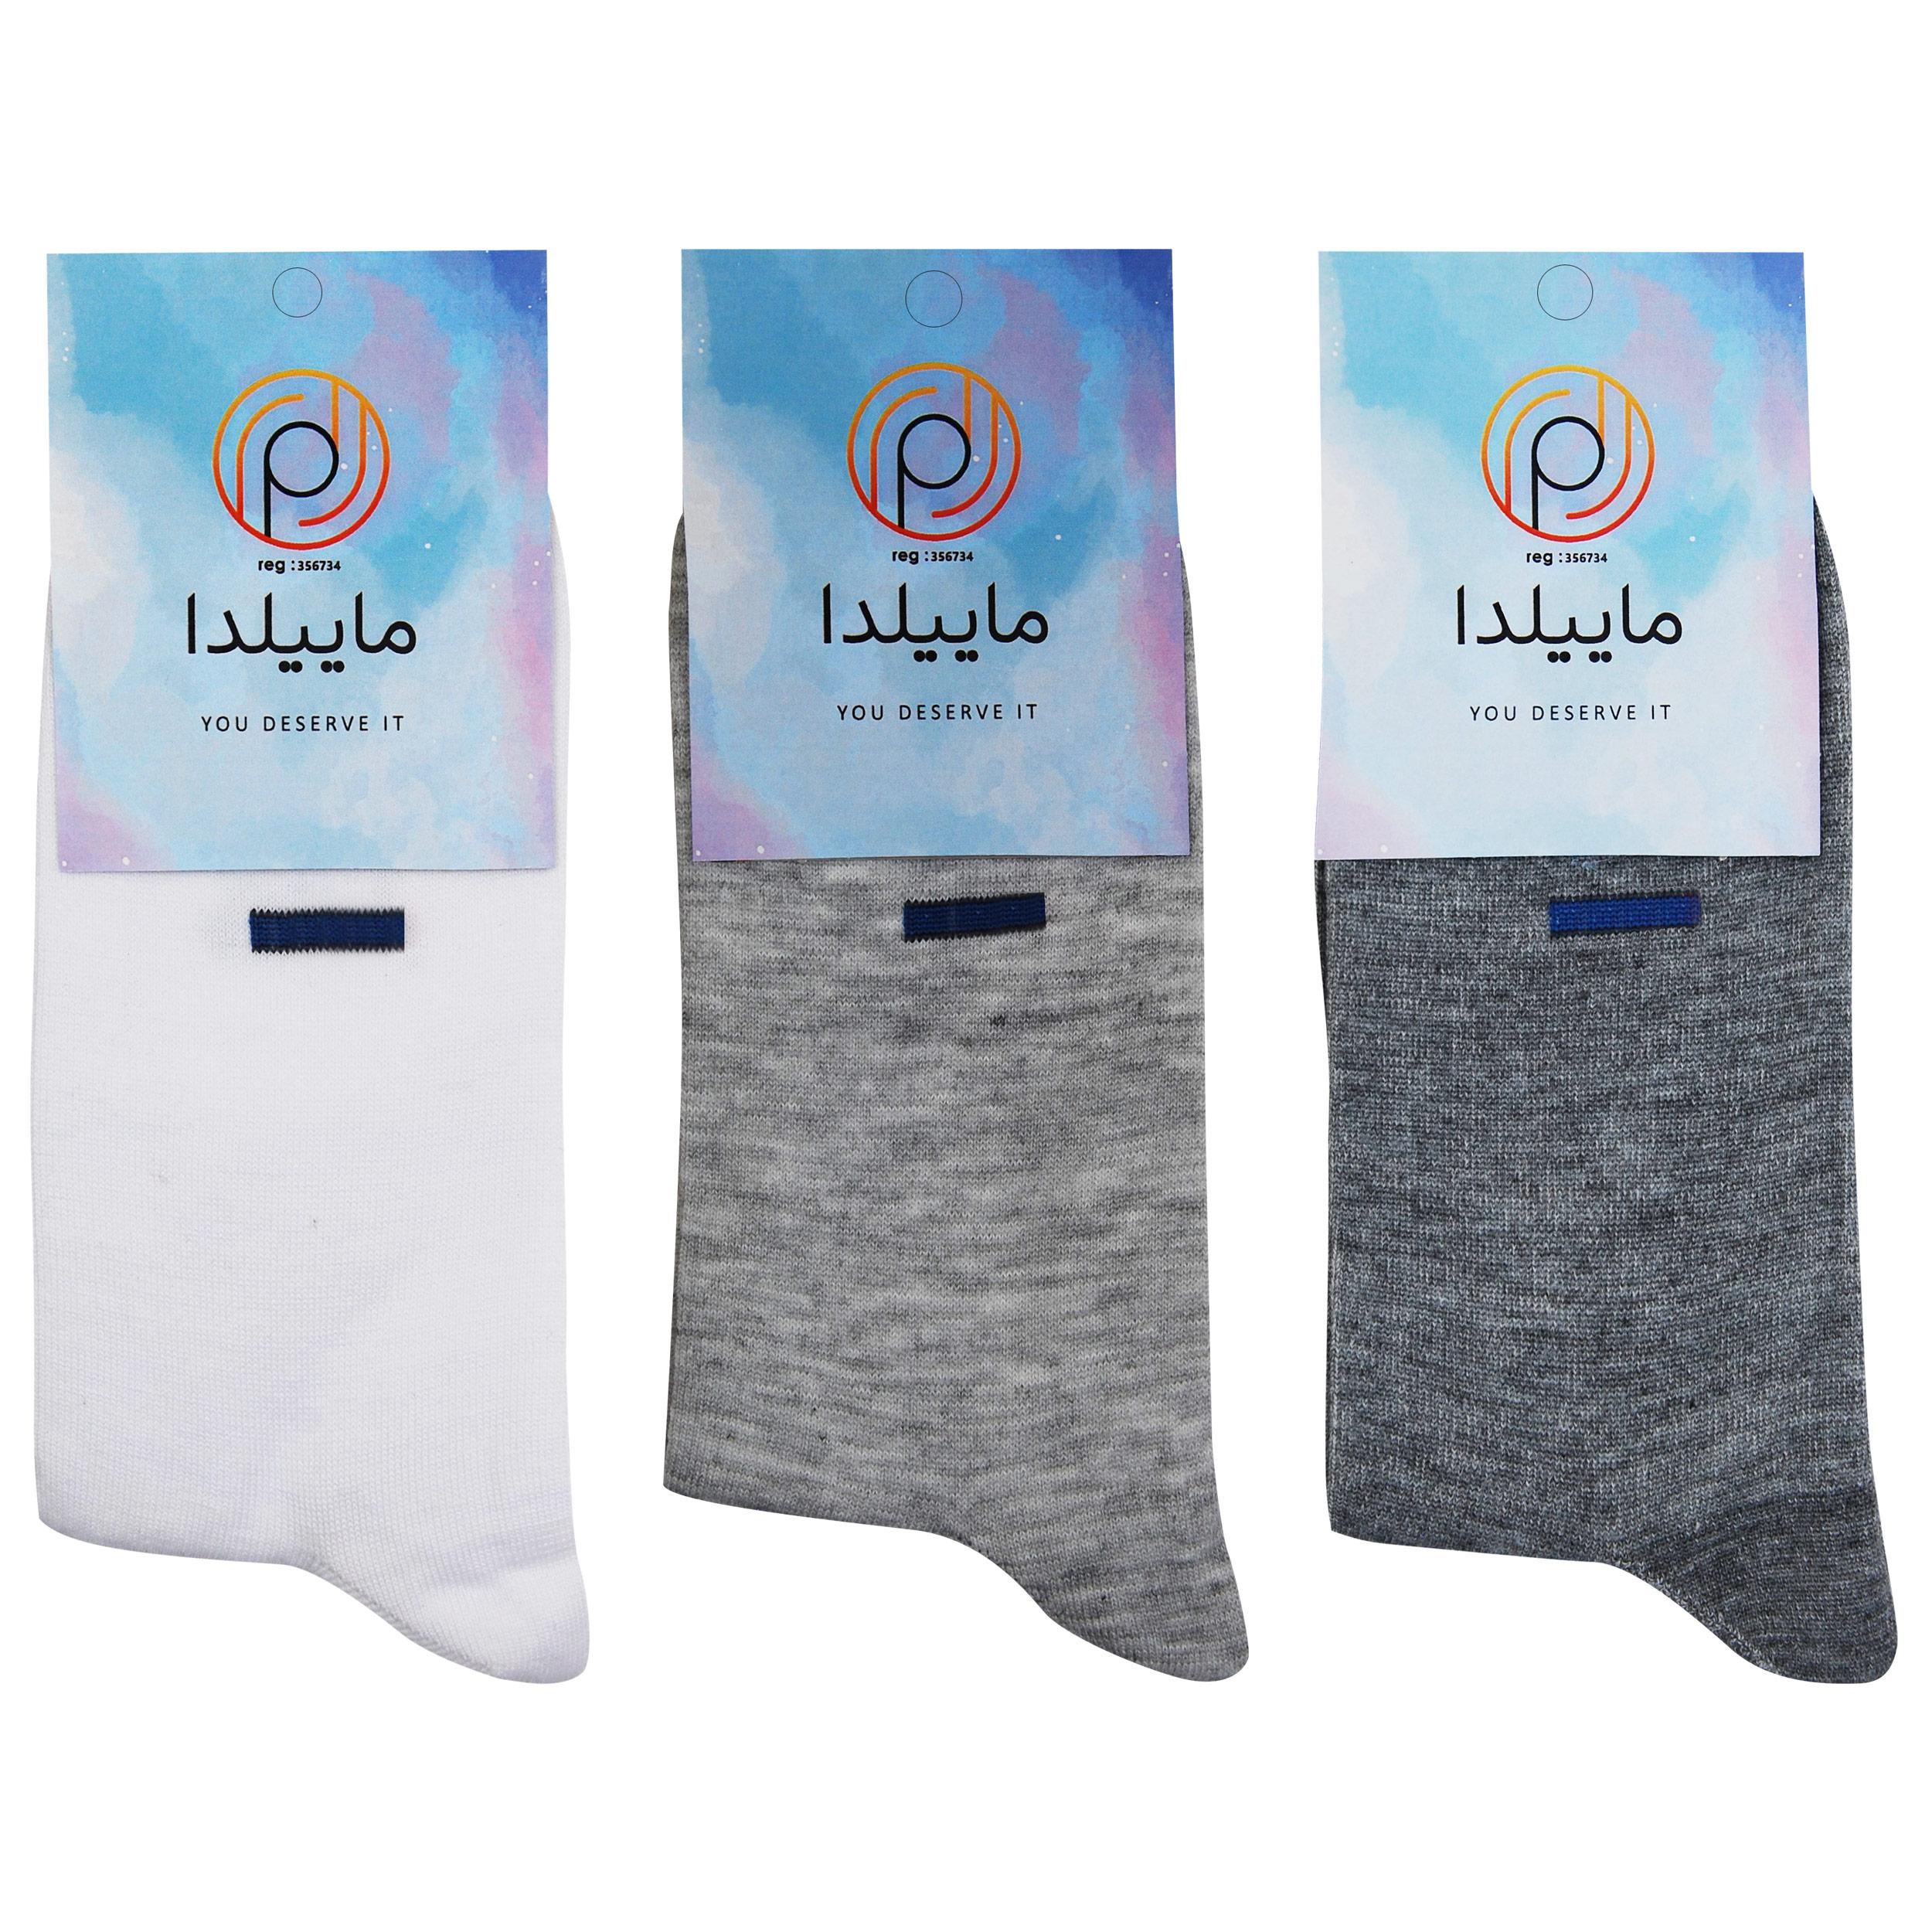 جوراب مردانه ماییلدا کد 3416-120-2 مجموعه 3 عددی